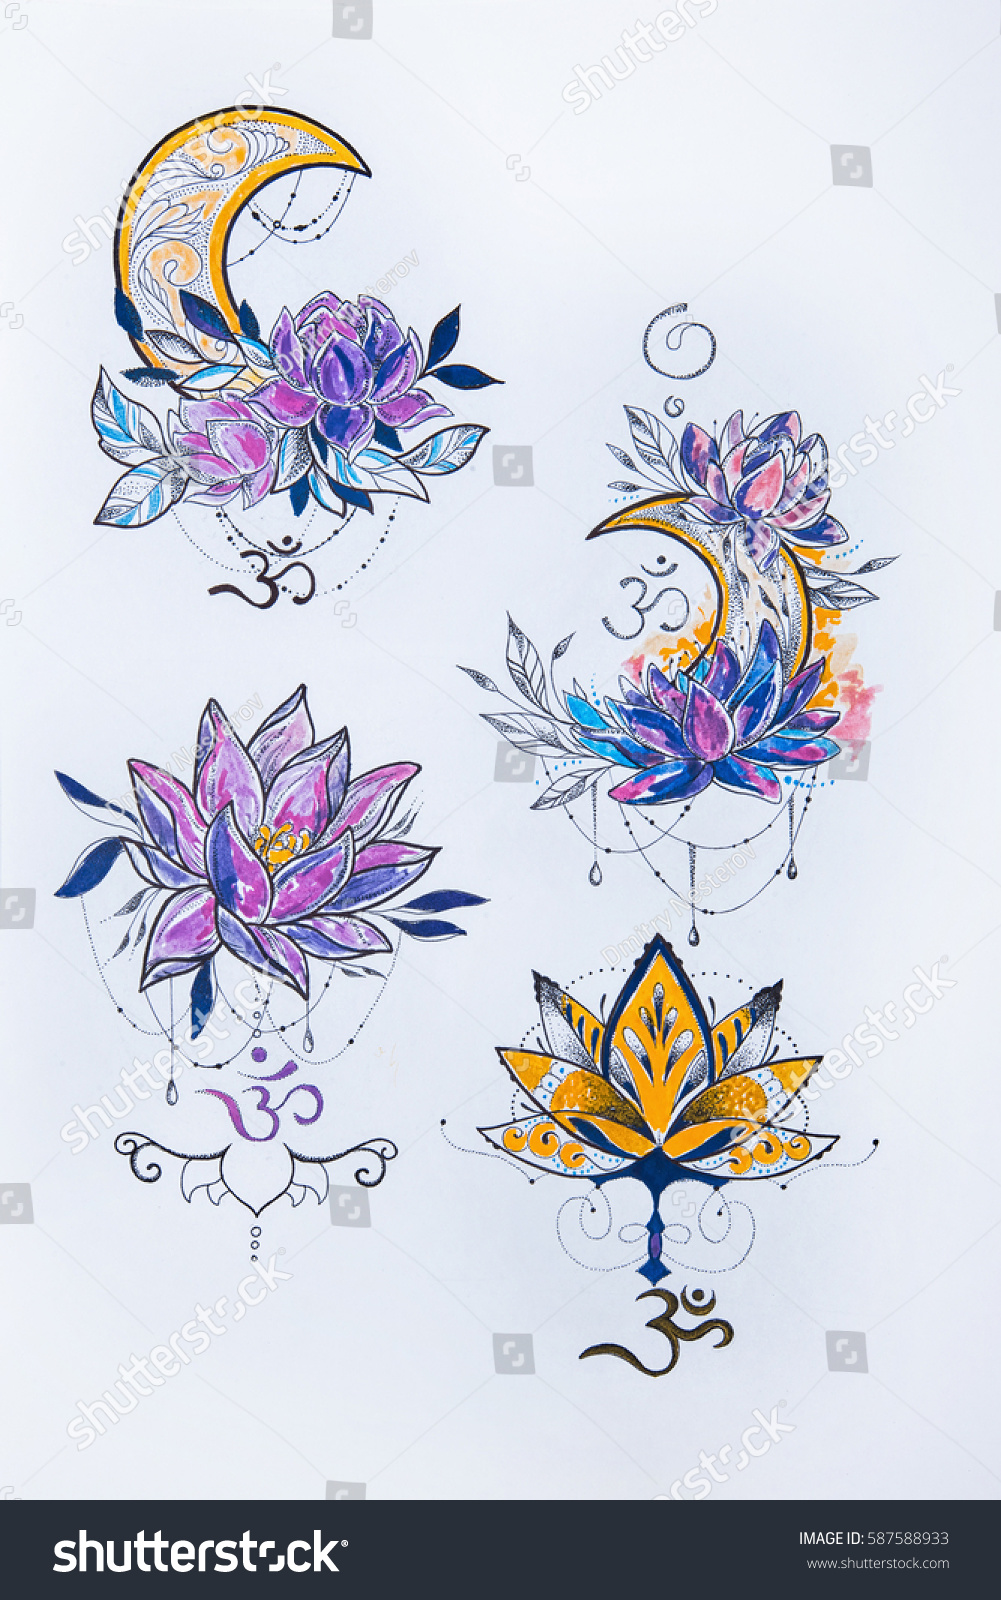 Sketch Lotus Moon On White Background Stock Illustration 587588933